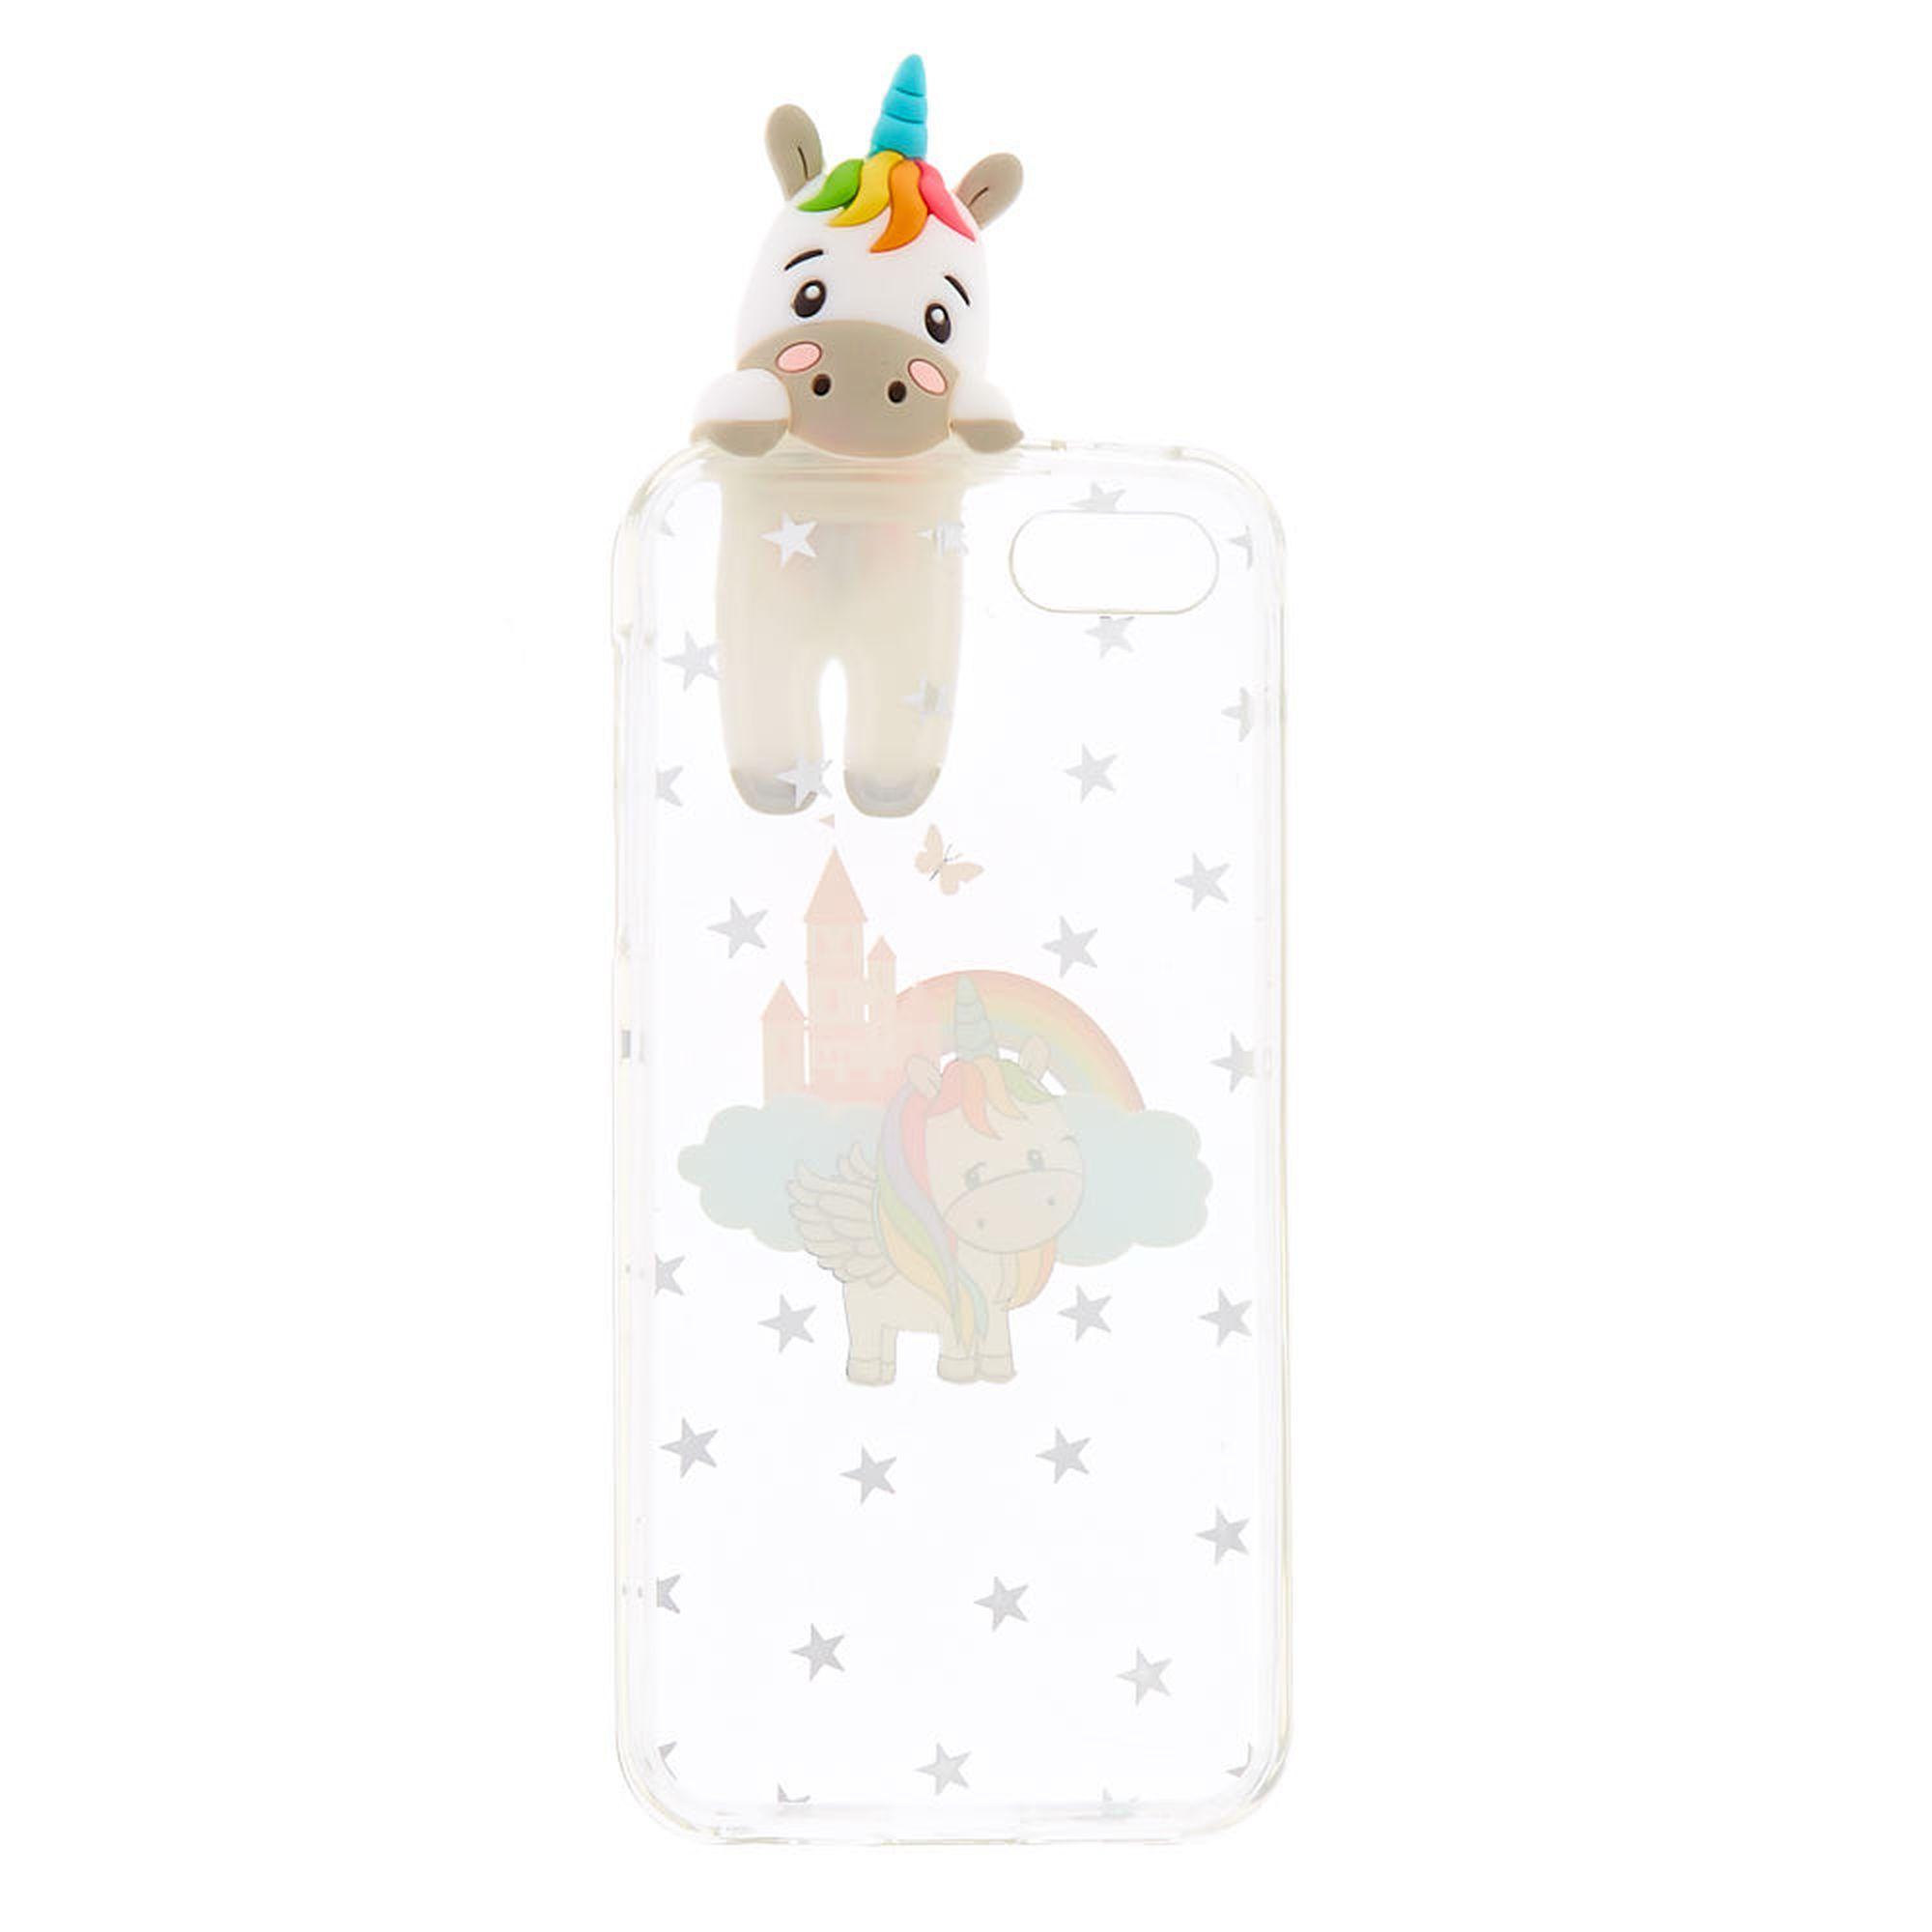 buy popular 7a175 e9e5b Peek A Boo Unicorn Phone Case | Claire's US | Technology in 2019 ...